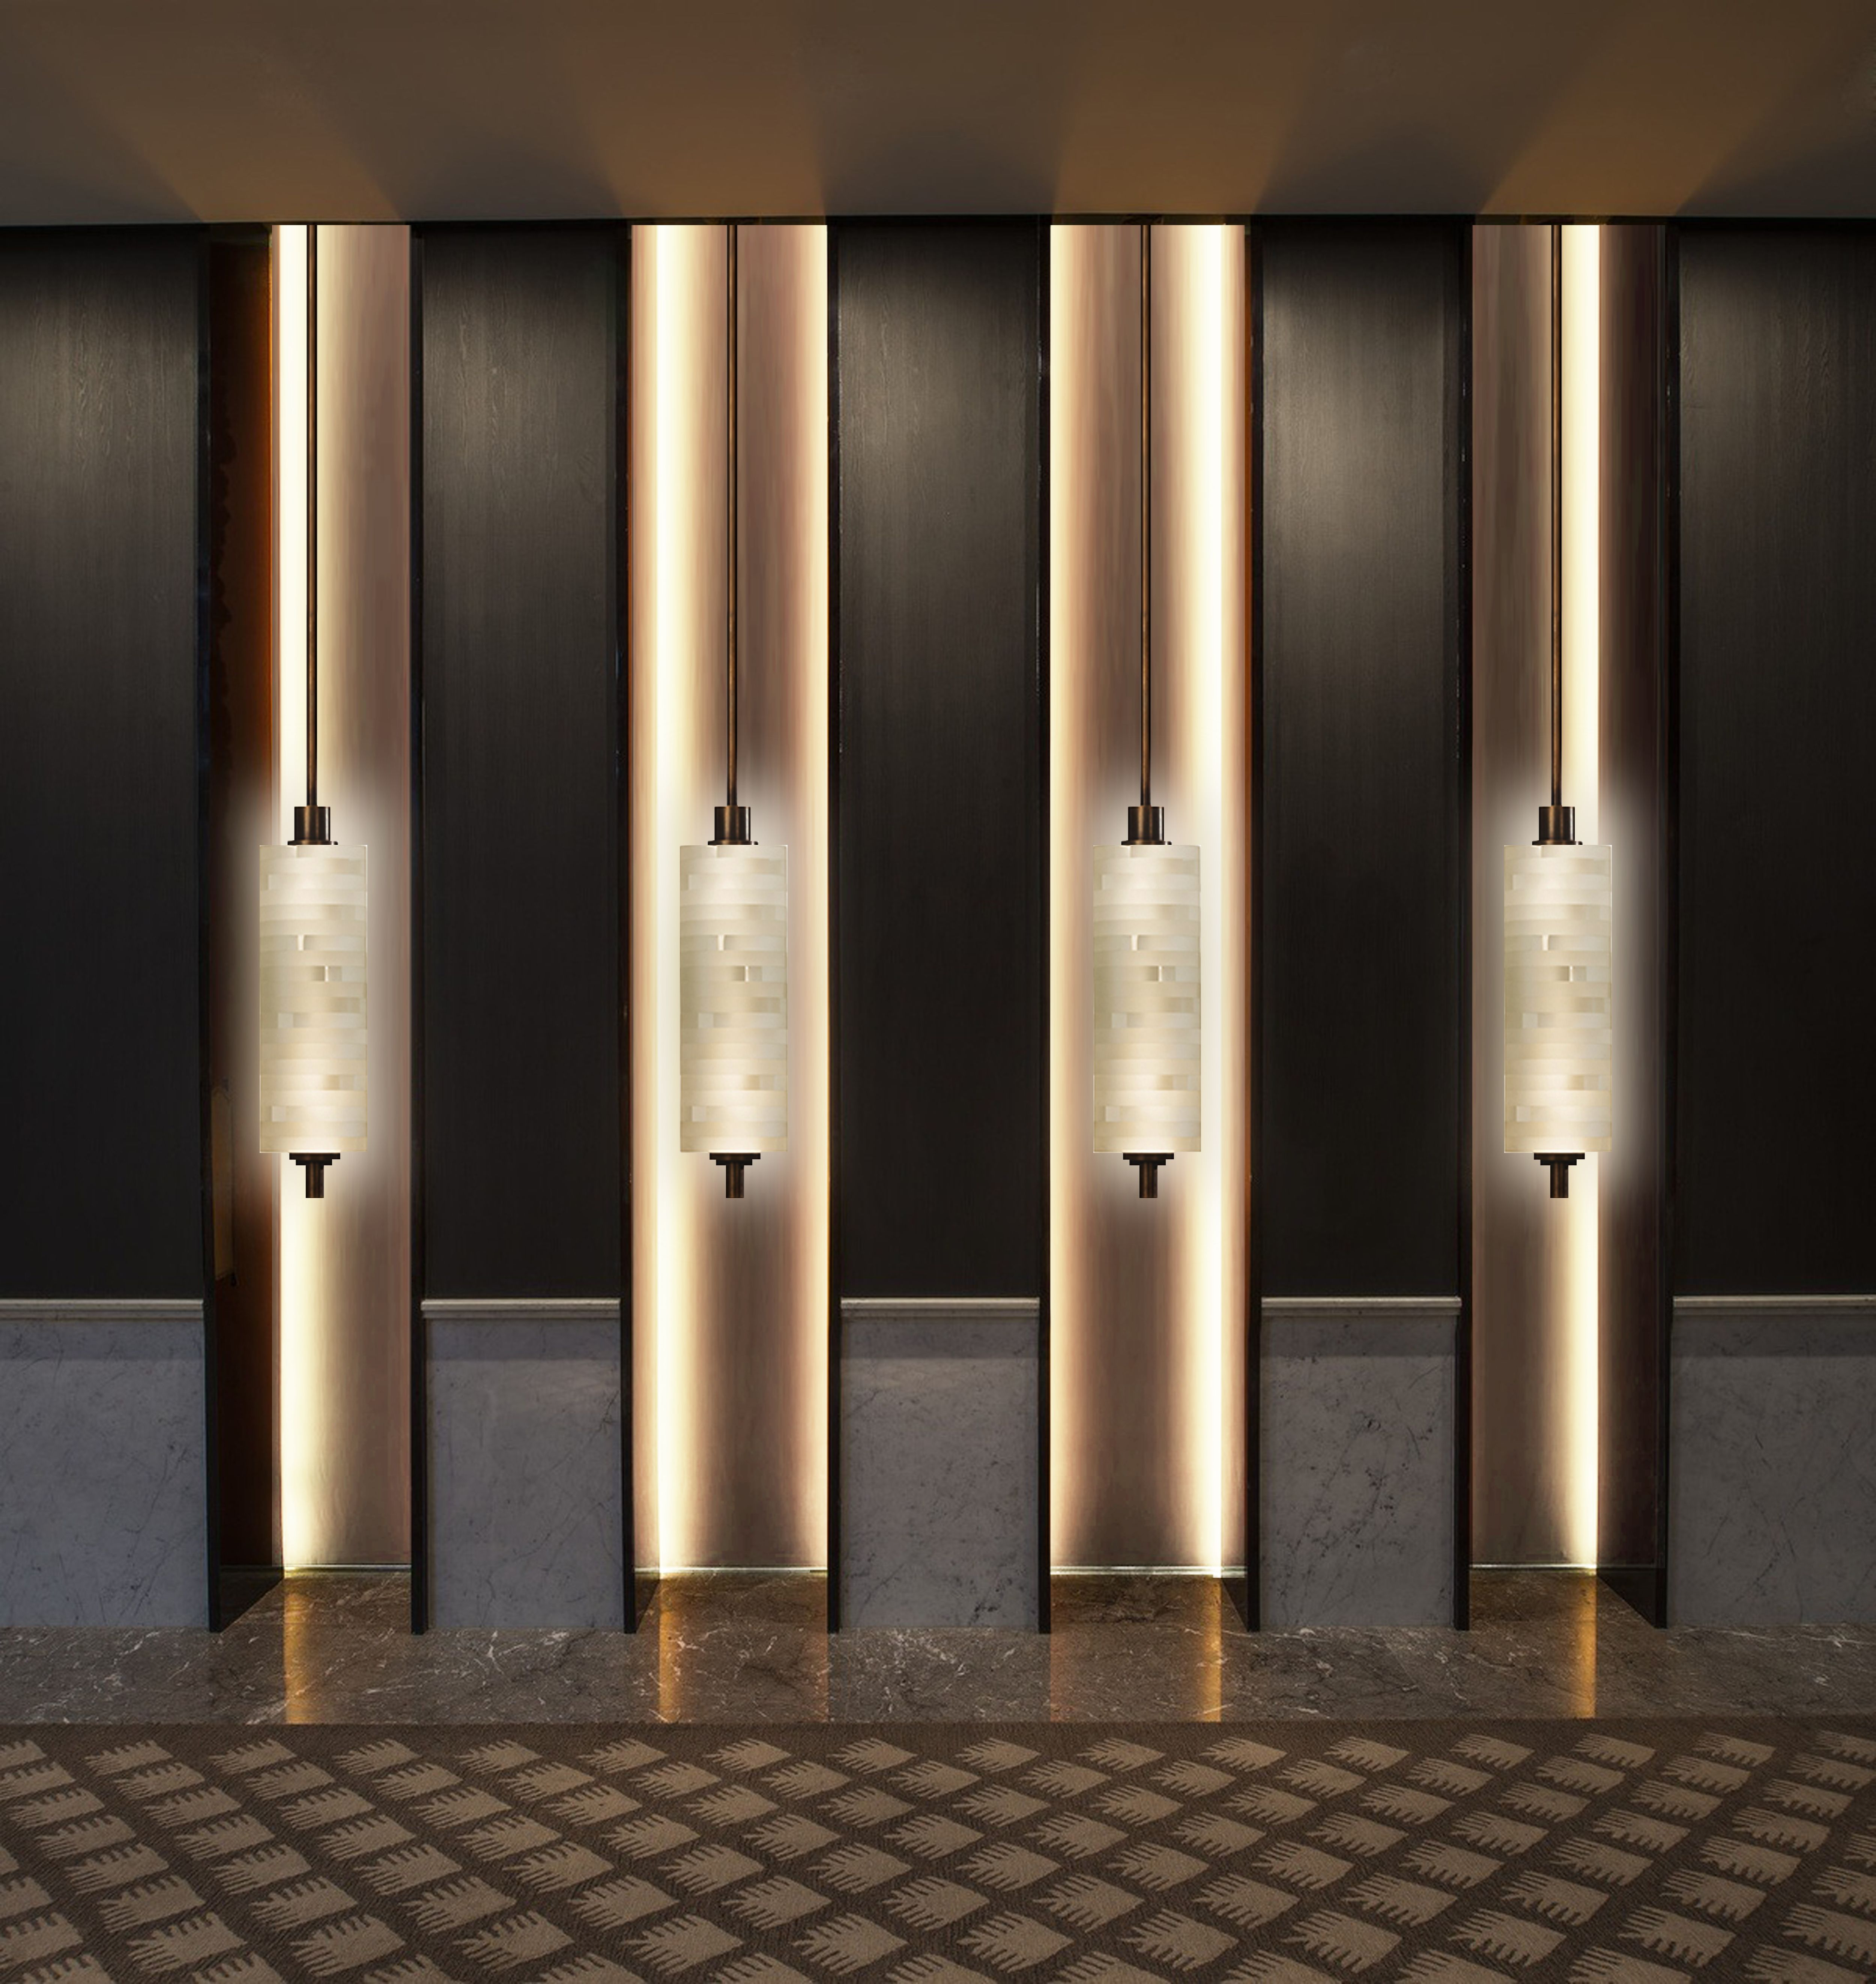 Lobby Design, Niche Design, Wall Design